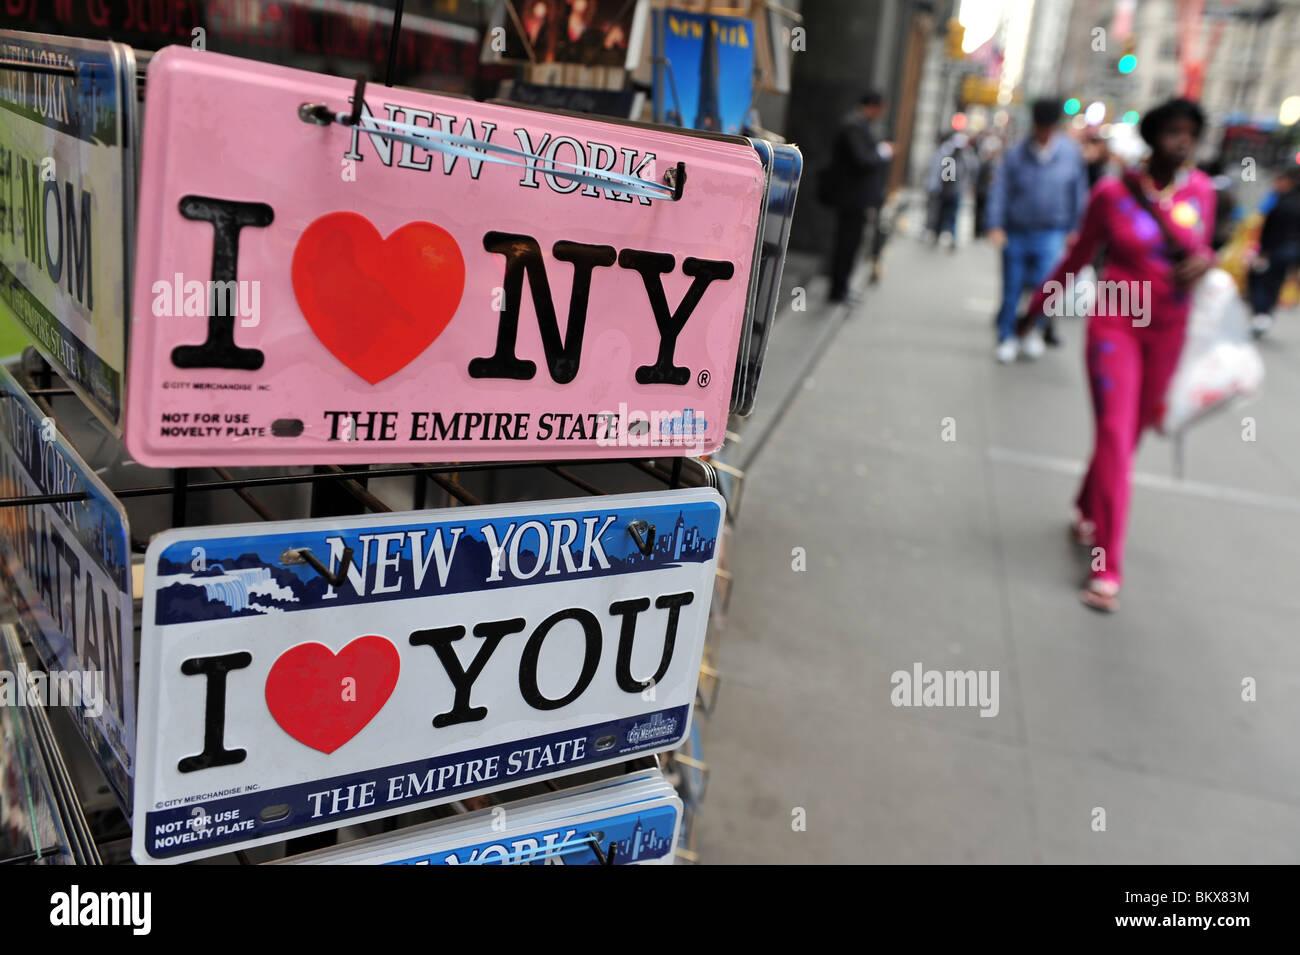 I Love NY .S.A N.Y New York La Big Apple Manhattan Photo Stock